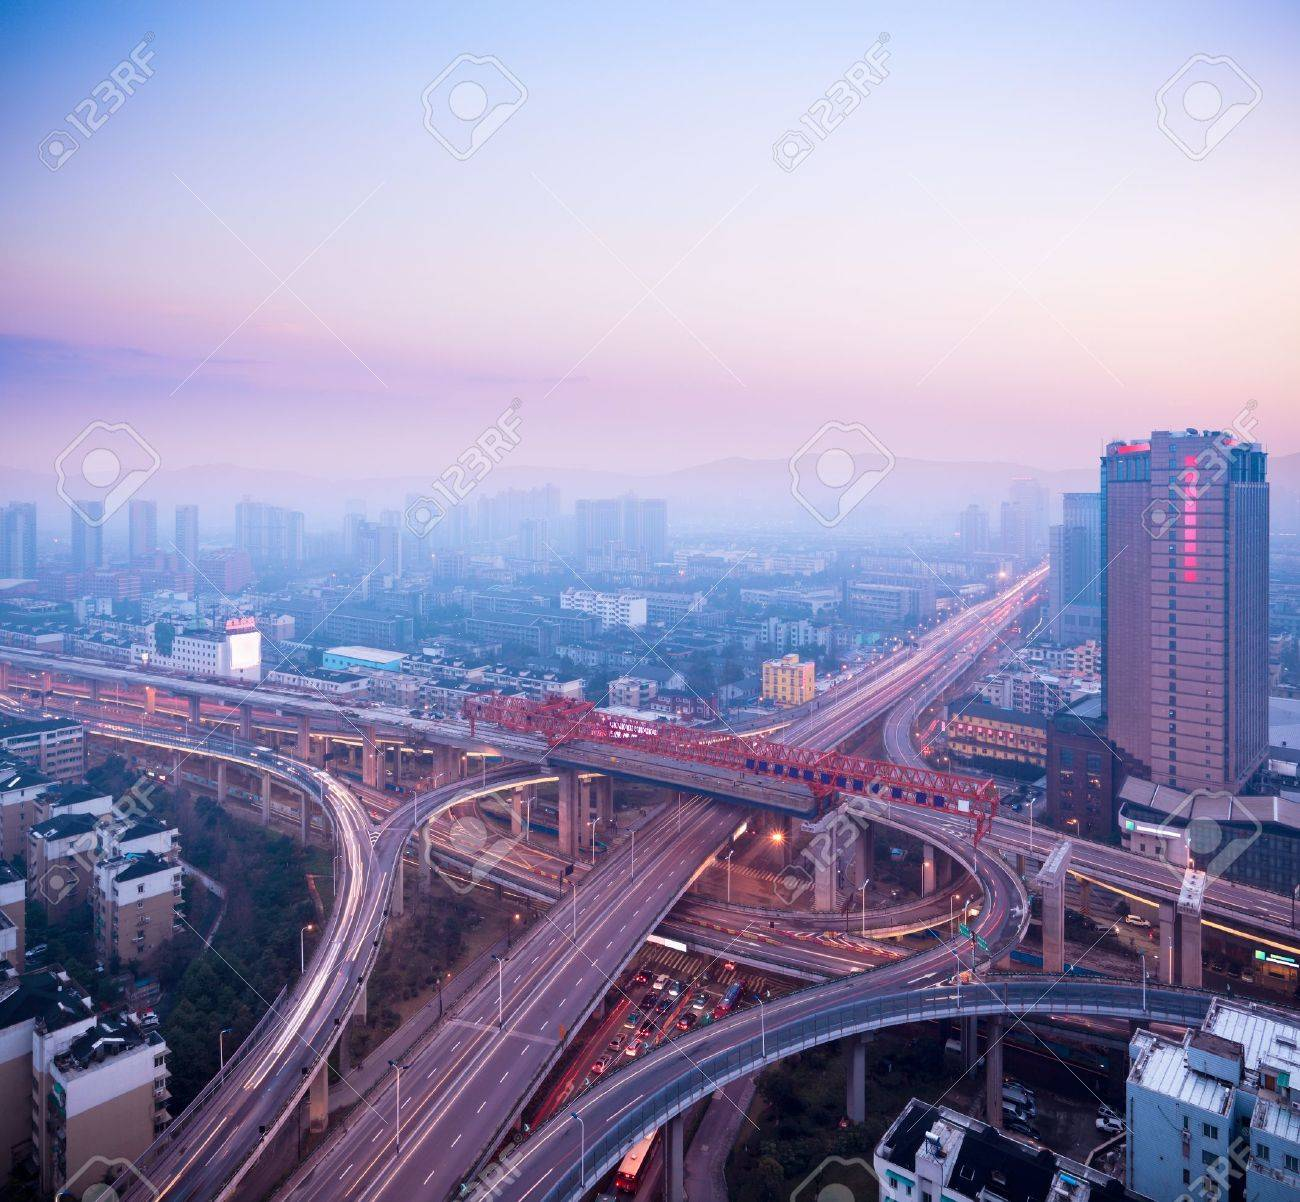 cloverleaf interchange at dusk,urban traffic concept Stock Photo - 13775948